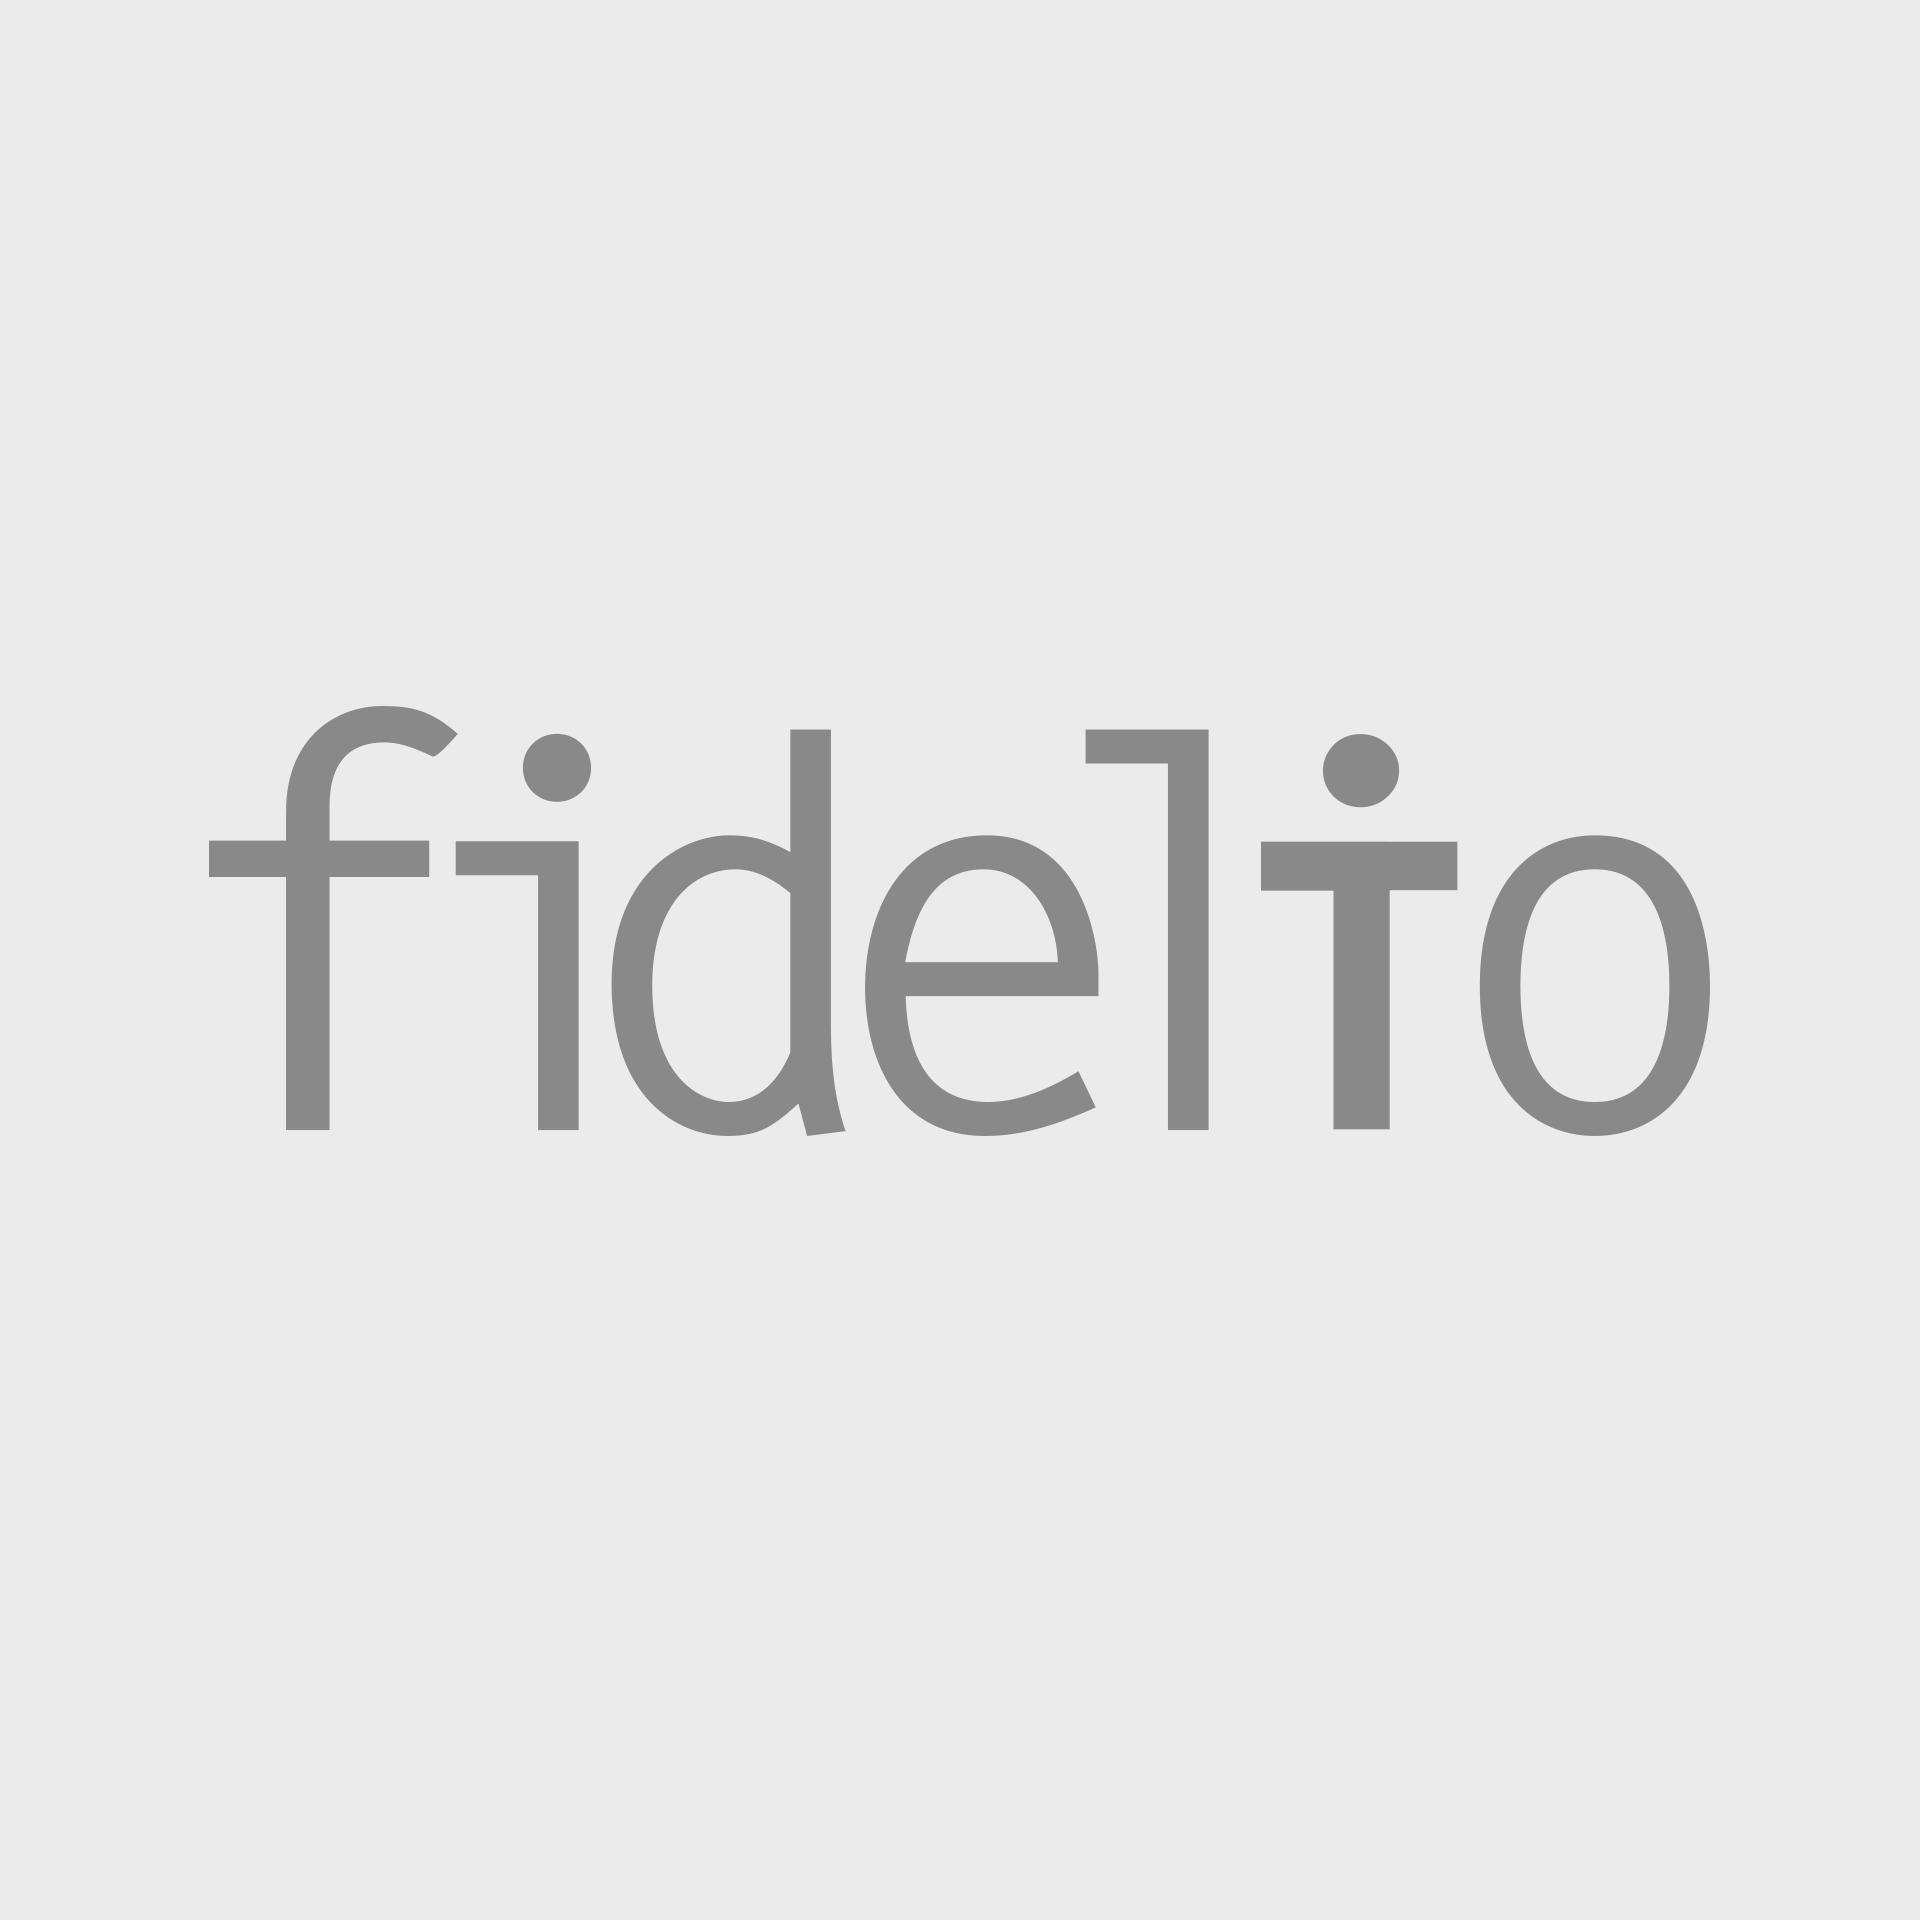 LID_10_Dontos_2020-111841.jpg